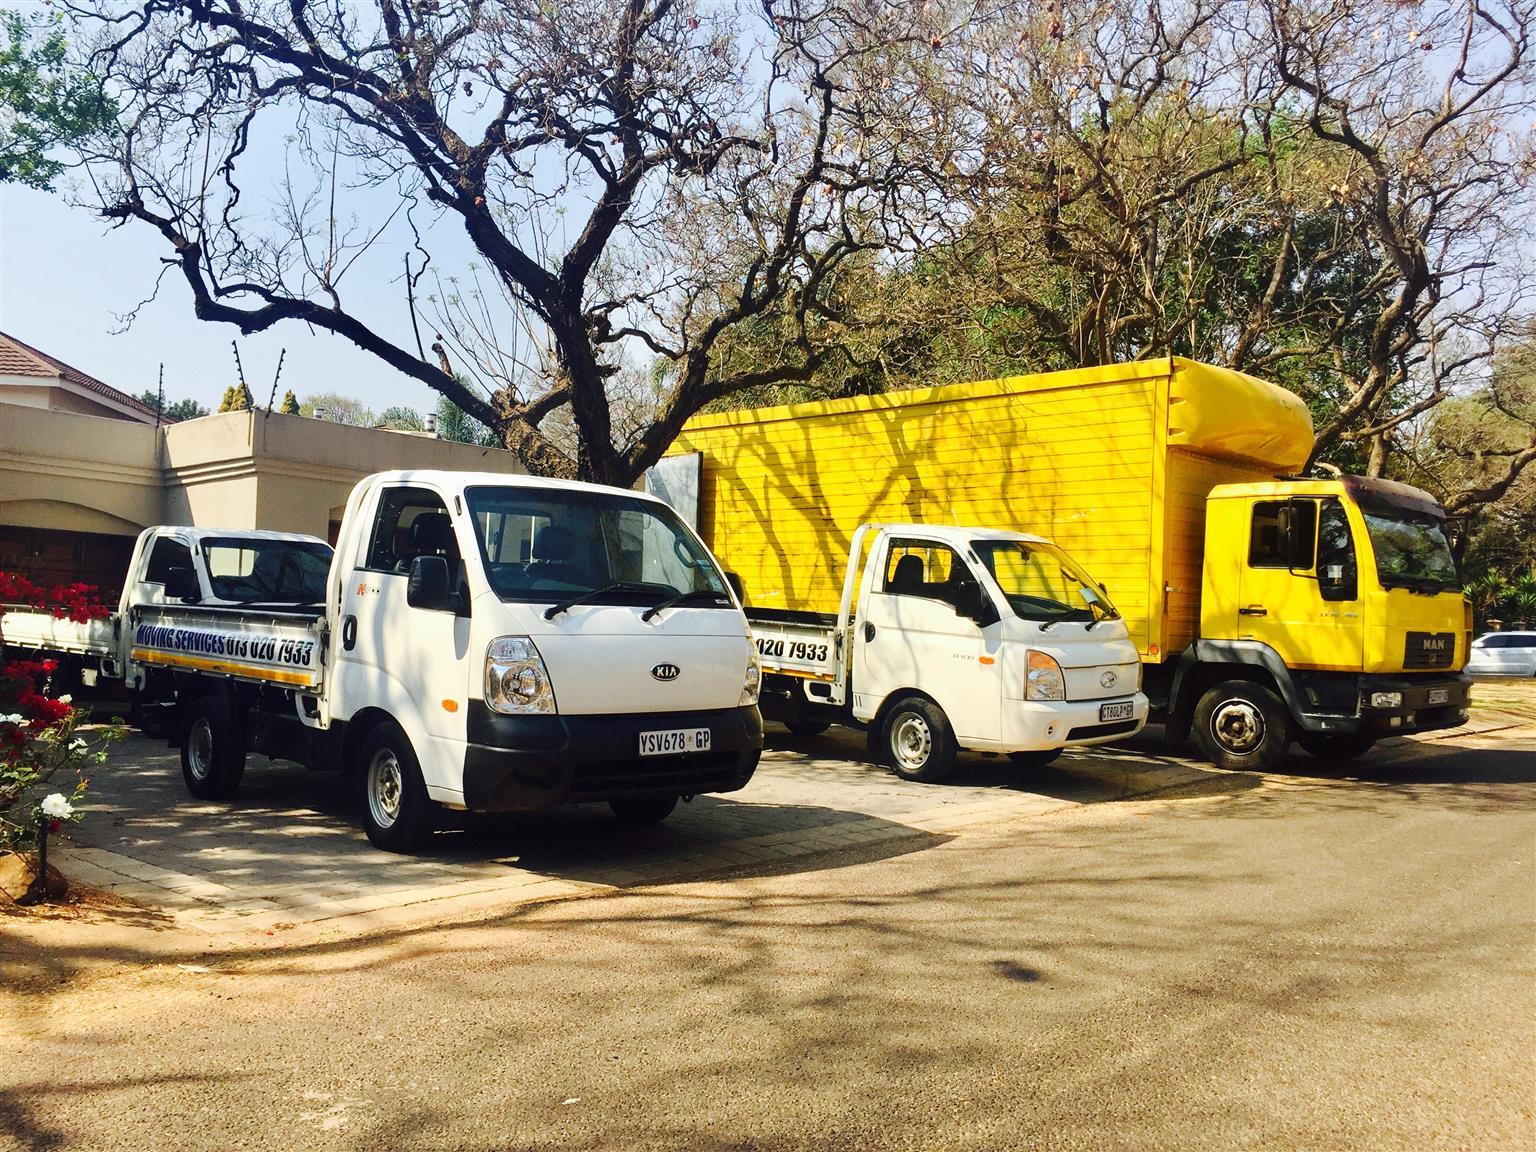 Furniture Removals Pretoria Johannesburg Centurion Trending News Today